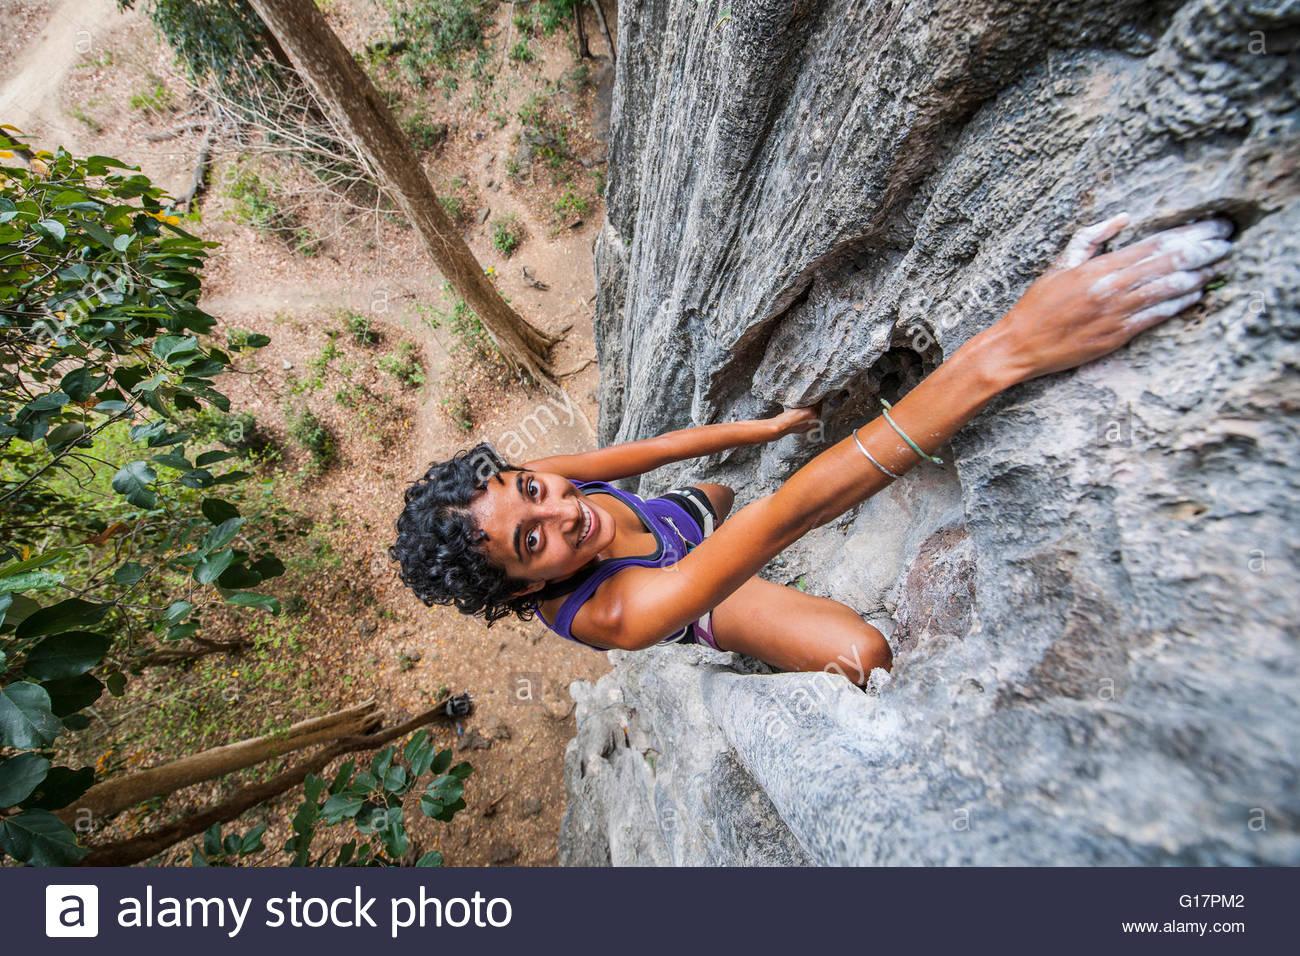 High angle portrait of young woman sport climbing rock face, Thakhek, Khammouane, Laos - Stock Image